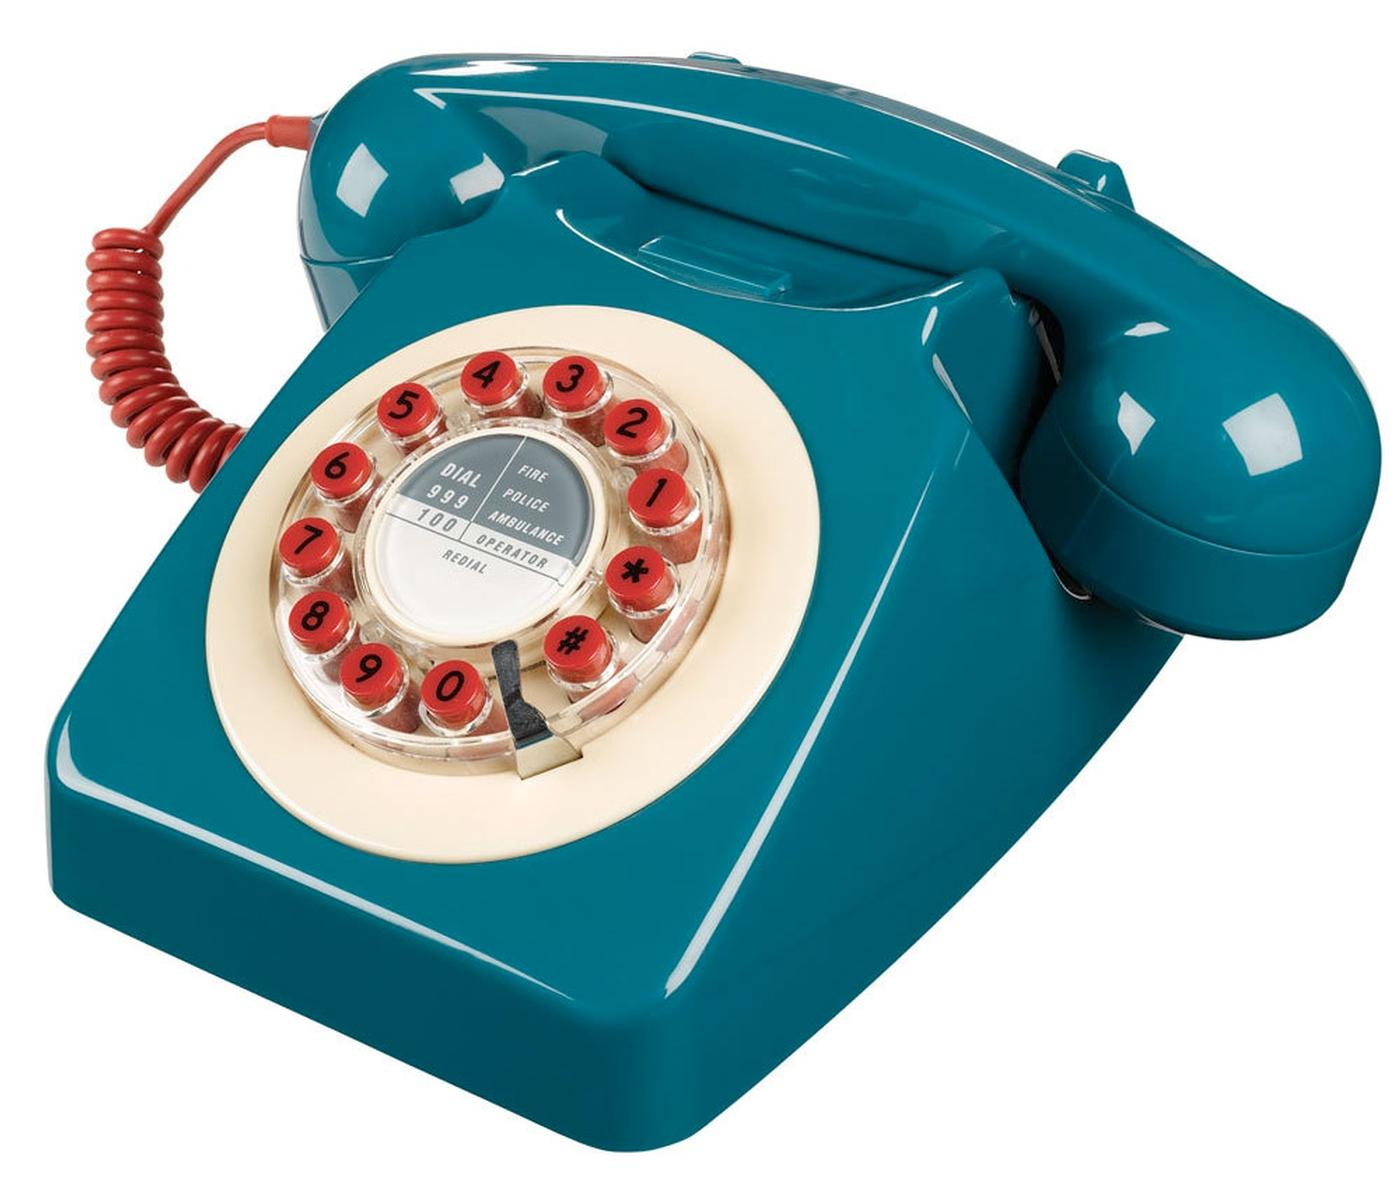 746 series mod telephone retro 60s mod vintage mod target telephones. Black Bedroom Furniture Sets. Home Design Ideas